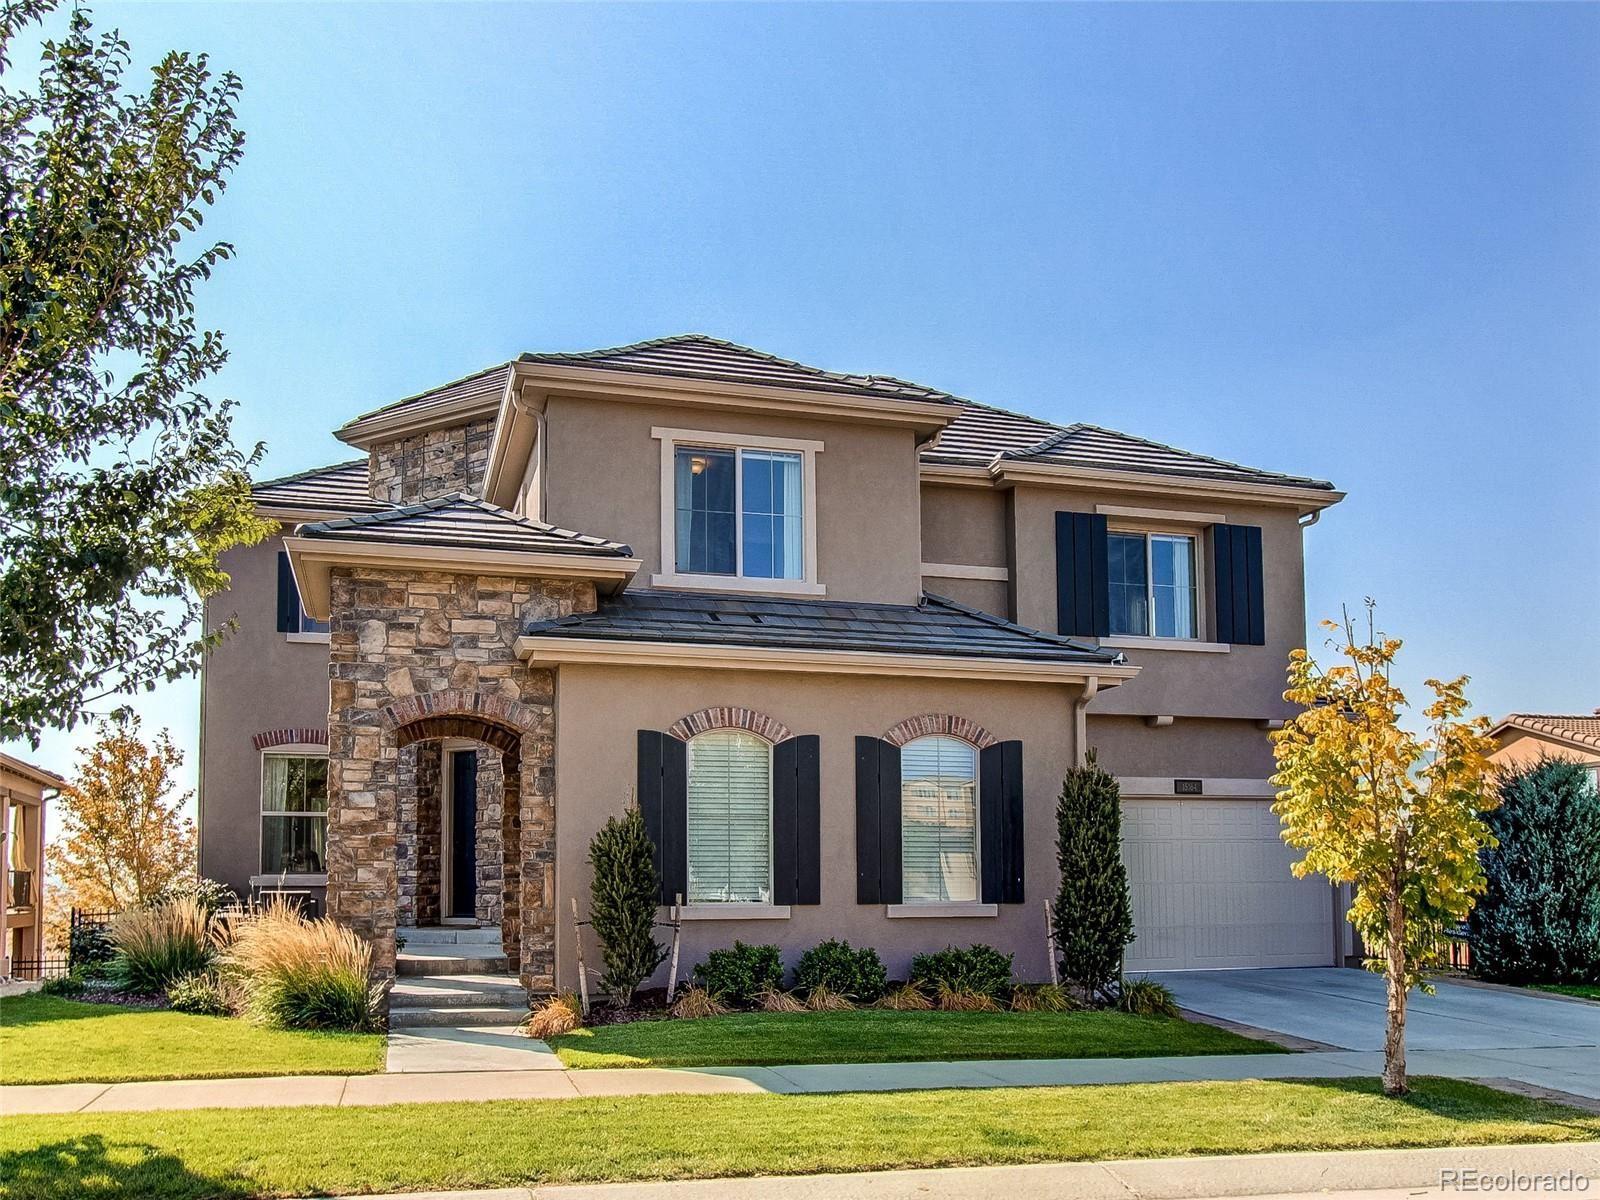 15164 W Washburn Avenue, Lakewood, CO 80228 - #: 8900231